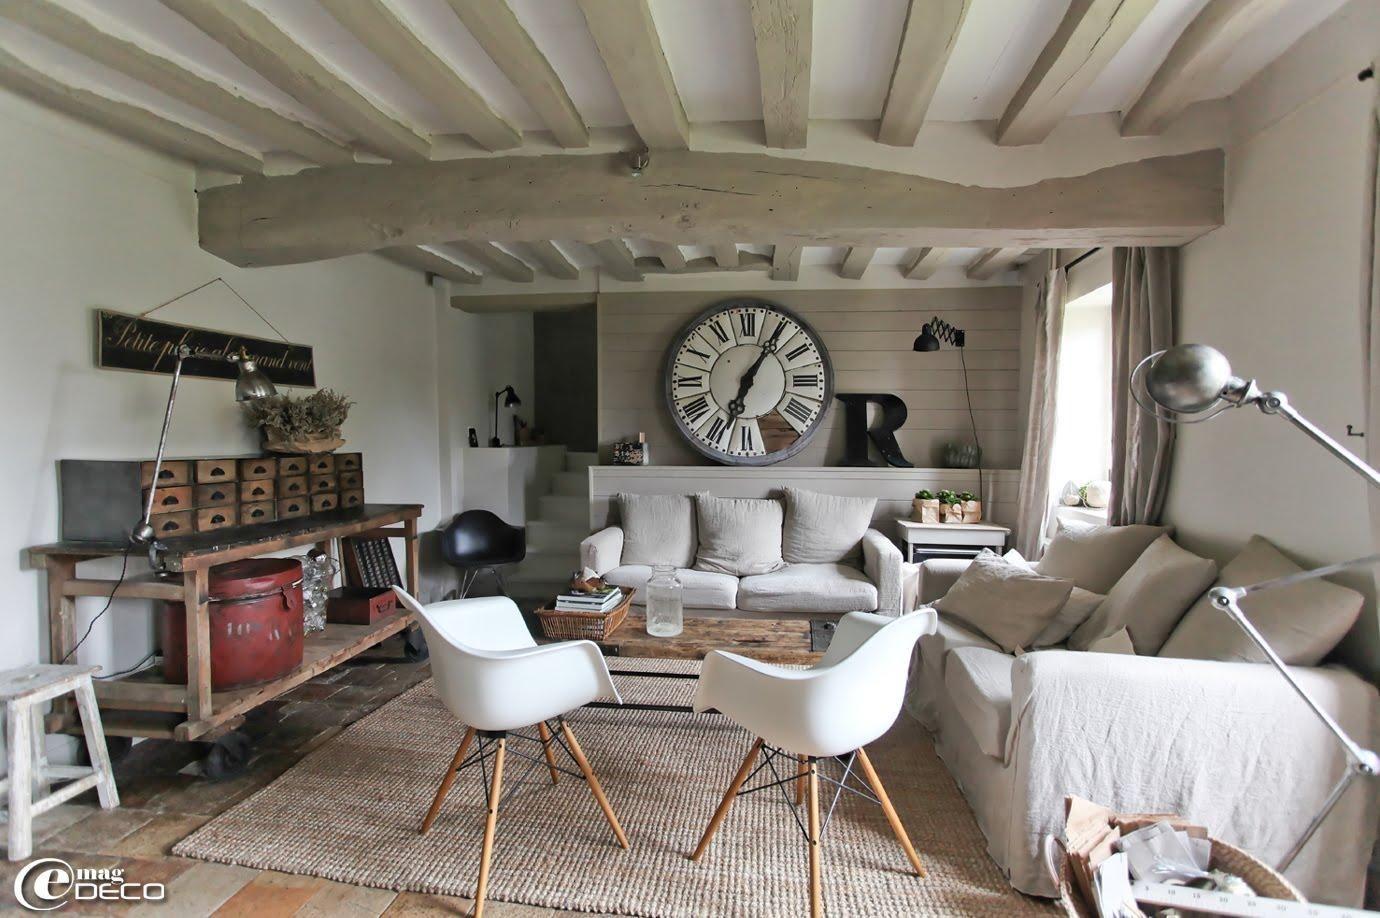 deco contemporaine maison ancienne - Recherche Google | Salon | Idee ...